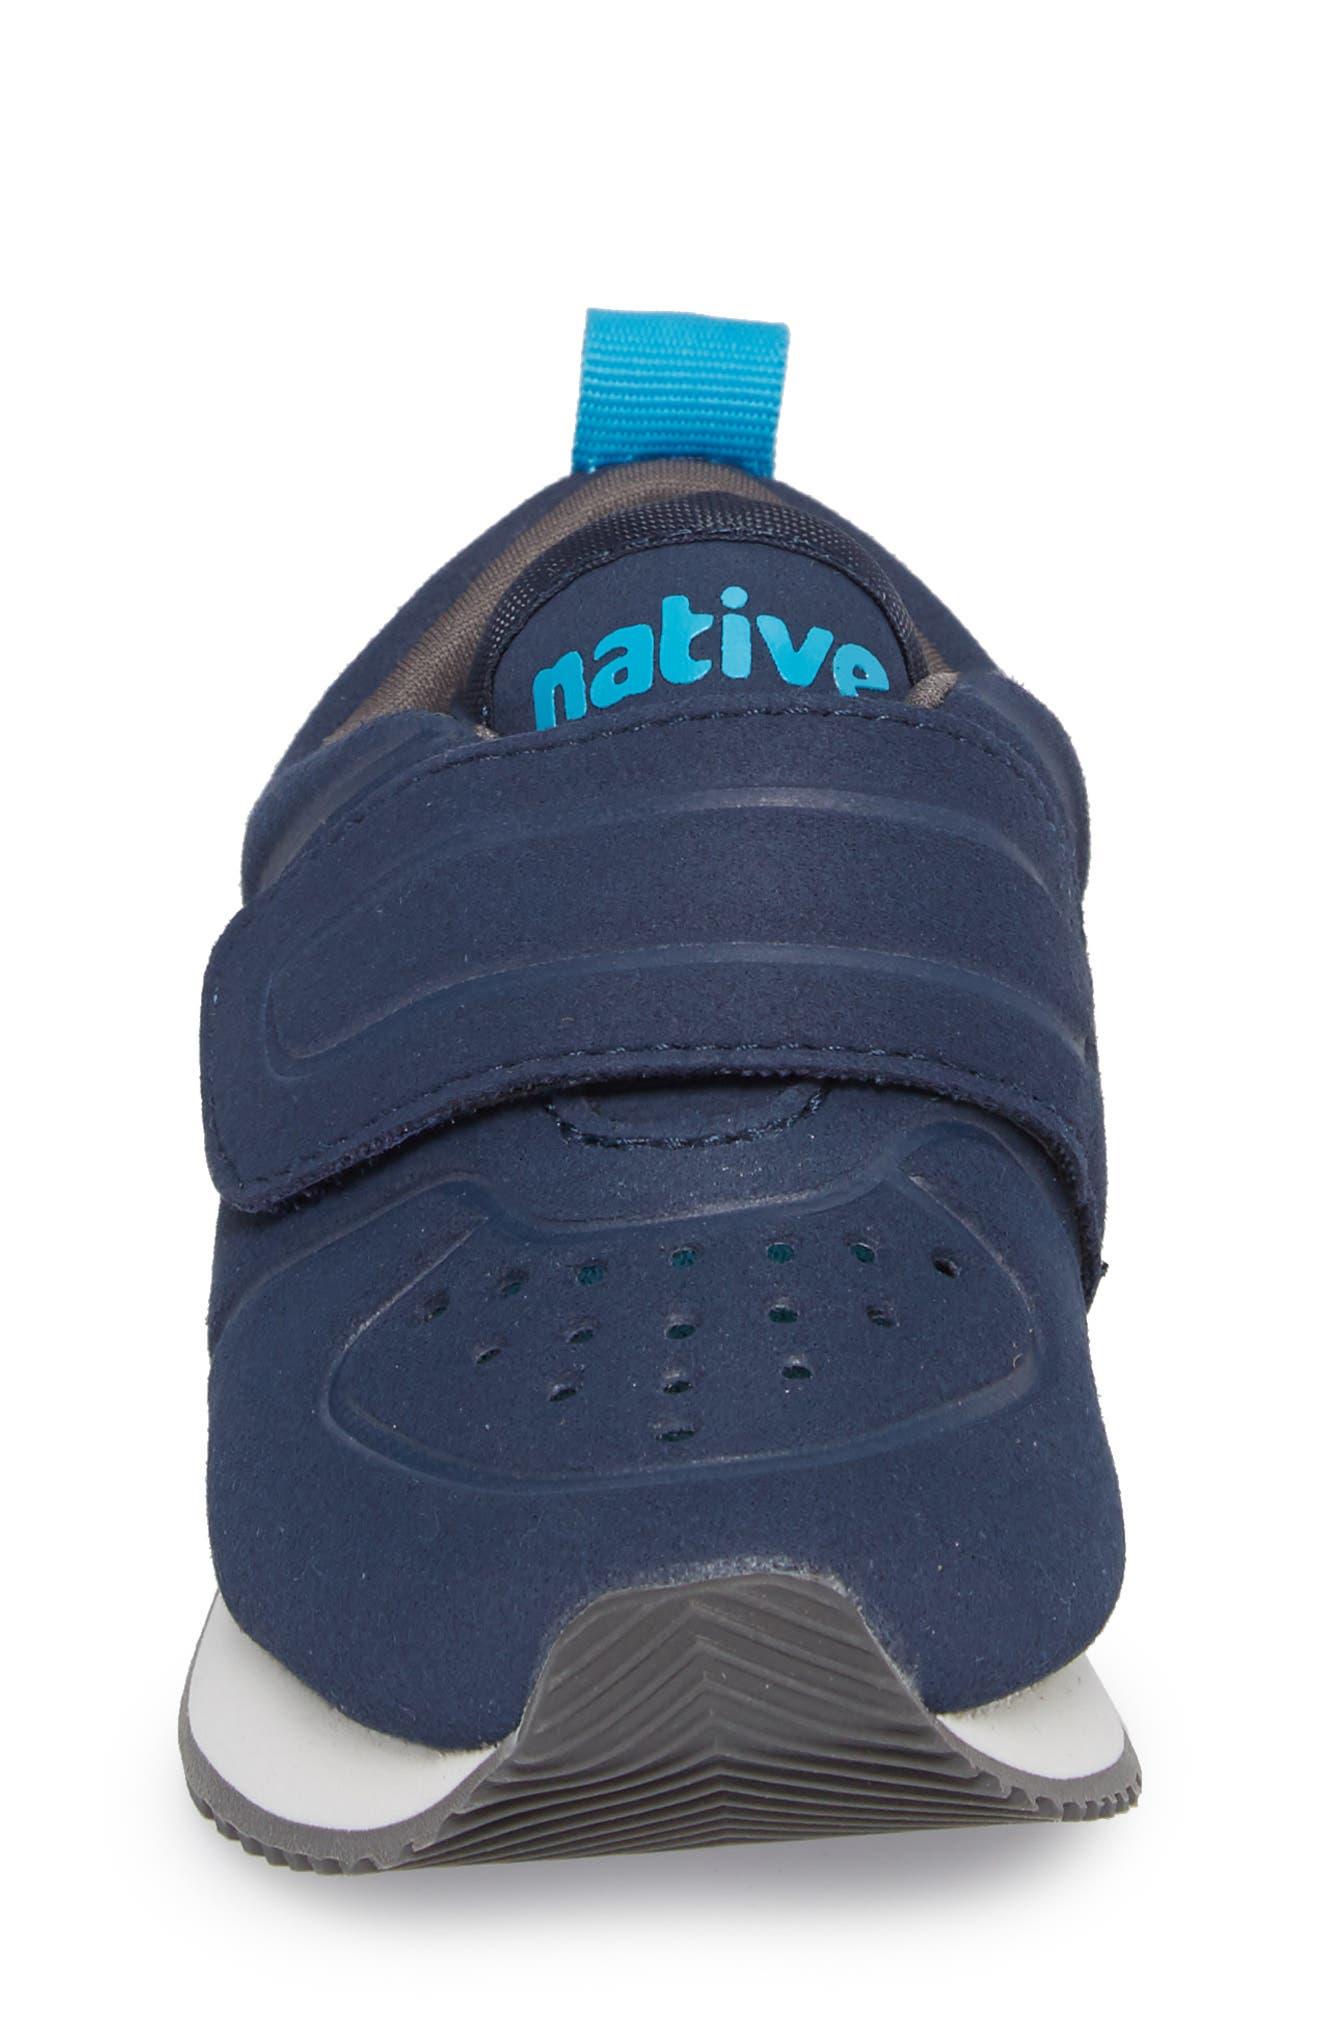 Native Cornell Perforated Sneaker,                             Alternate thumbnail 4, color,                             REGATTA BLUE/ SHELL WHITE